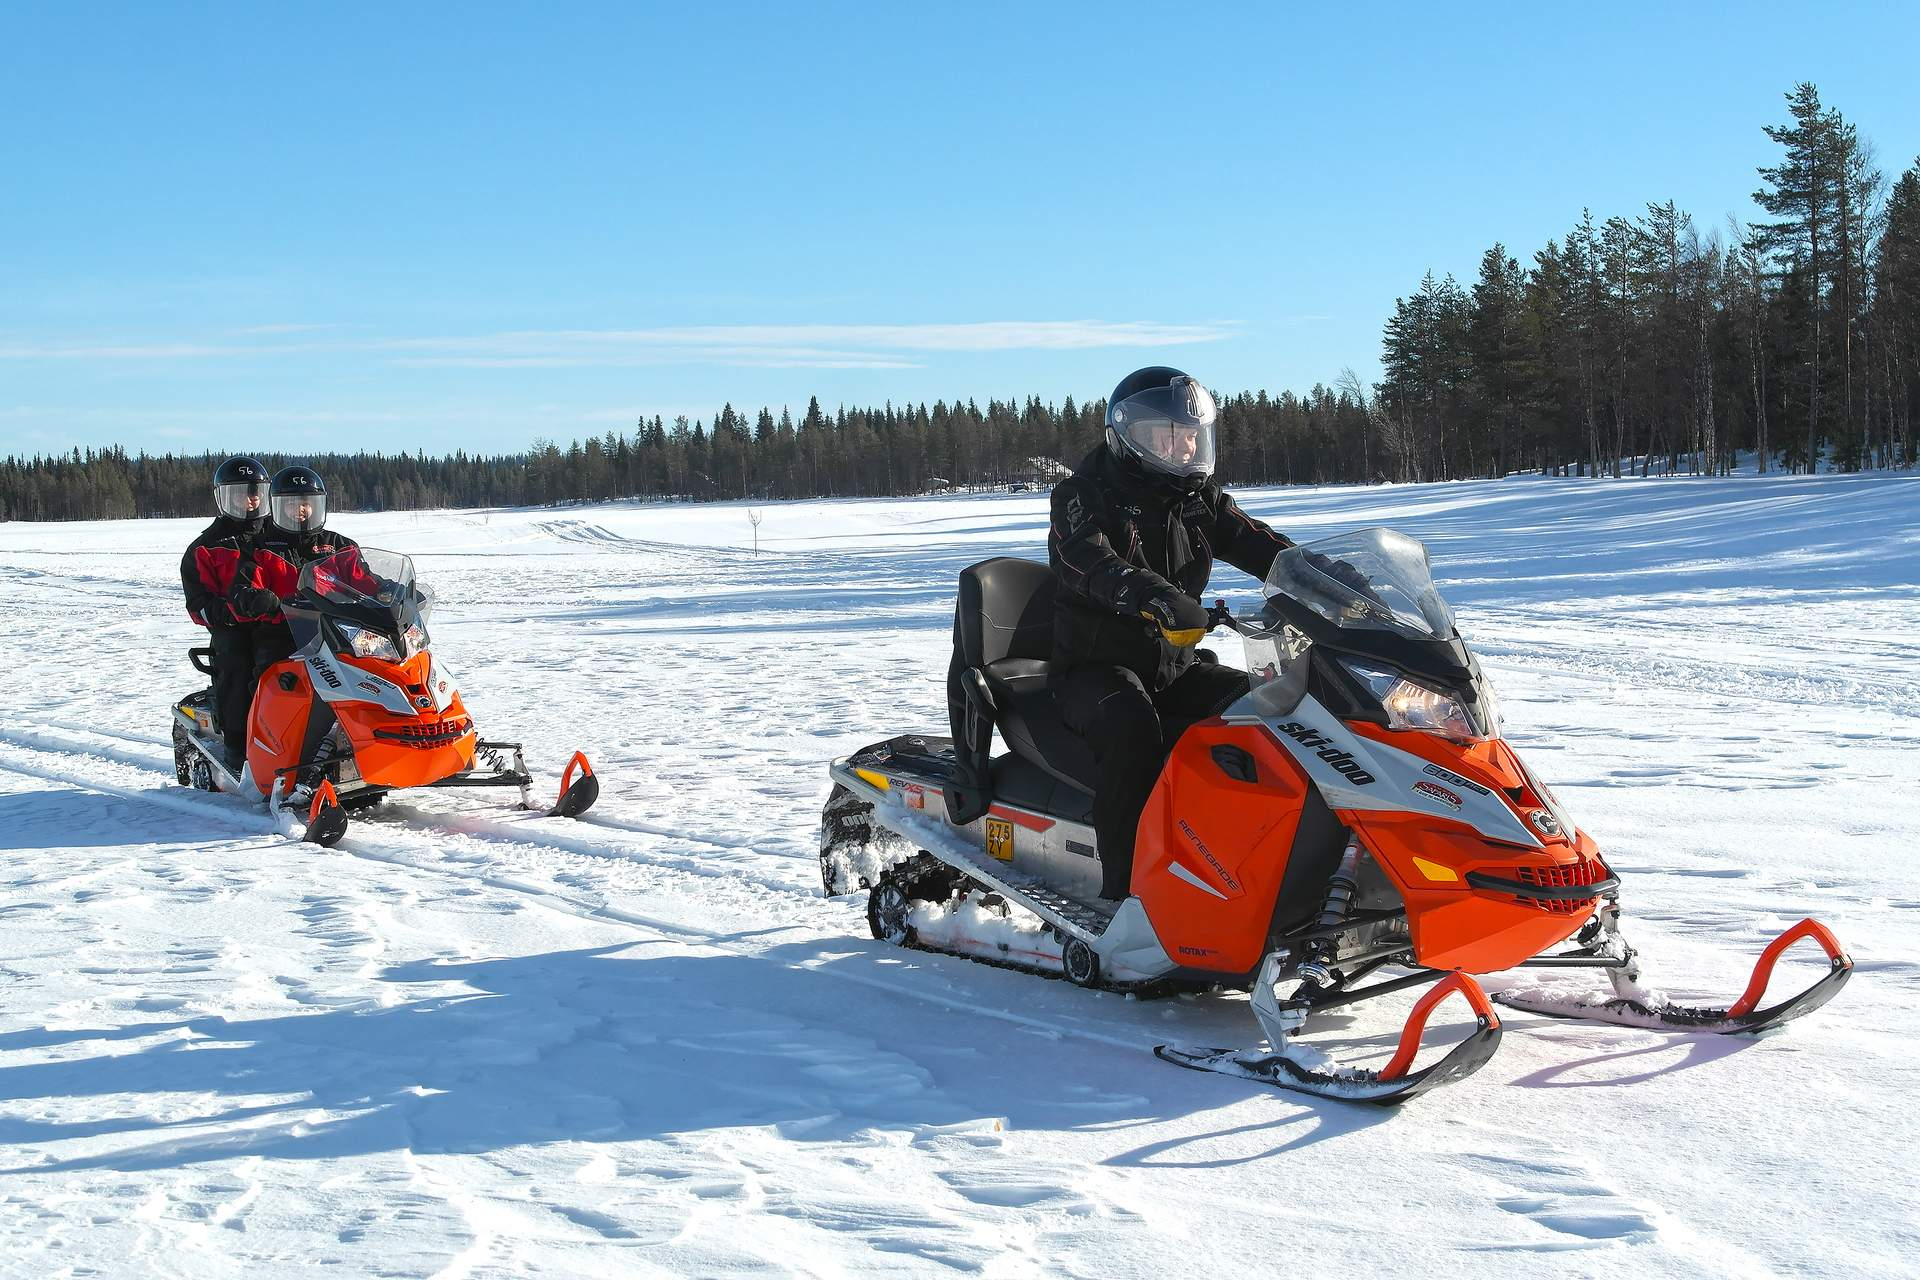 Finnland: Motorschlittenfahrt